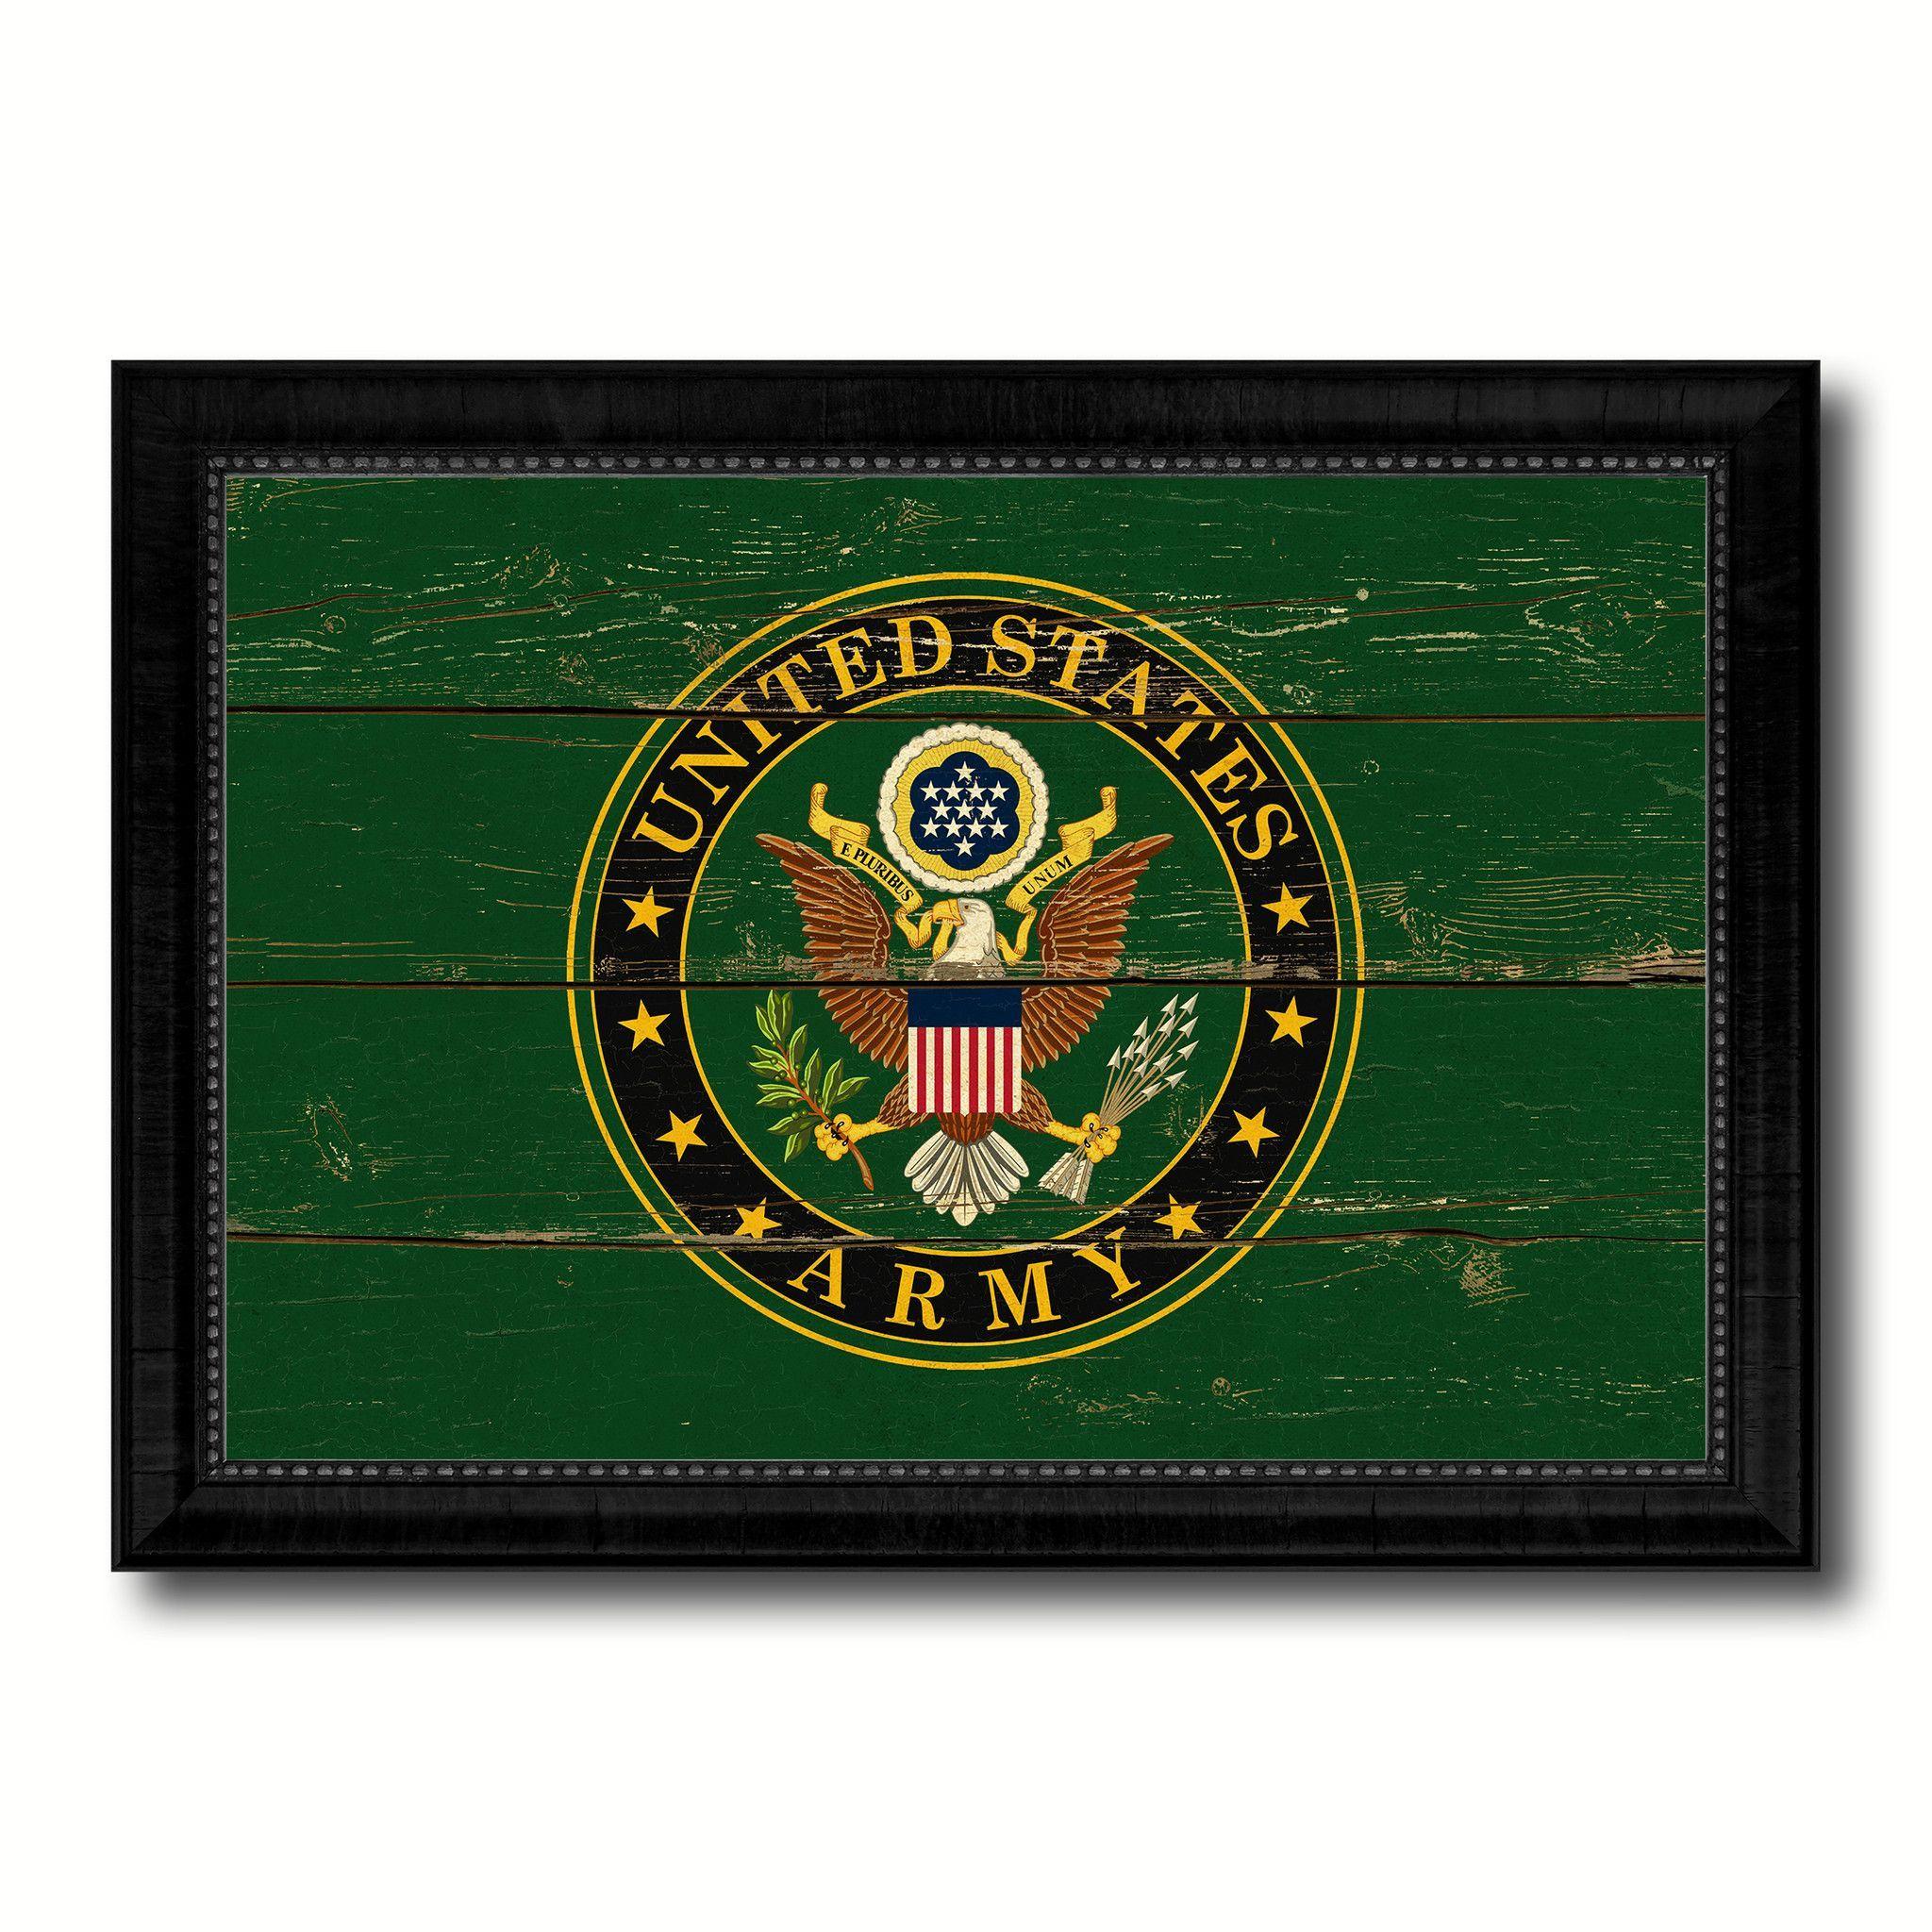 Us army house military flag vintage canvas print with black us army house military flag vintage canvas print with black picture frame home decor wall art decoration gift ideas jeuxipadfo Images